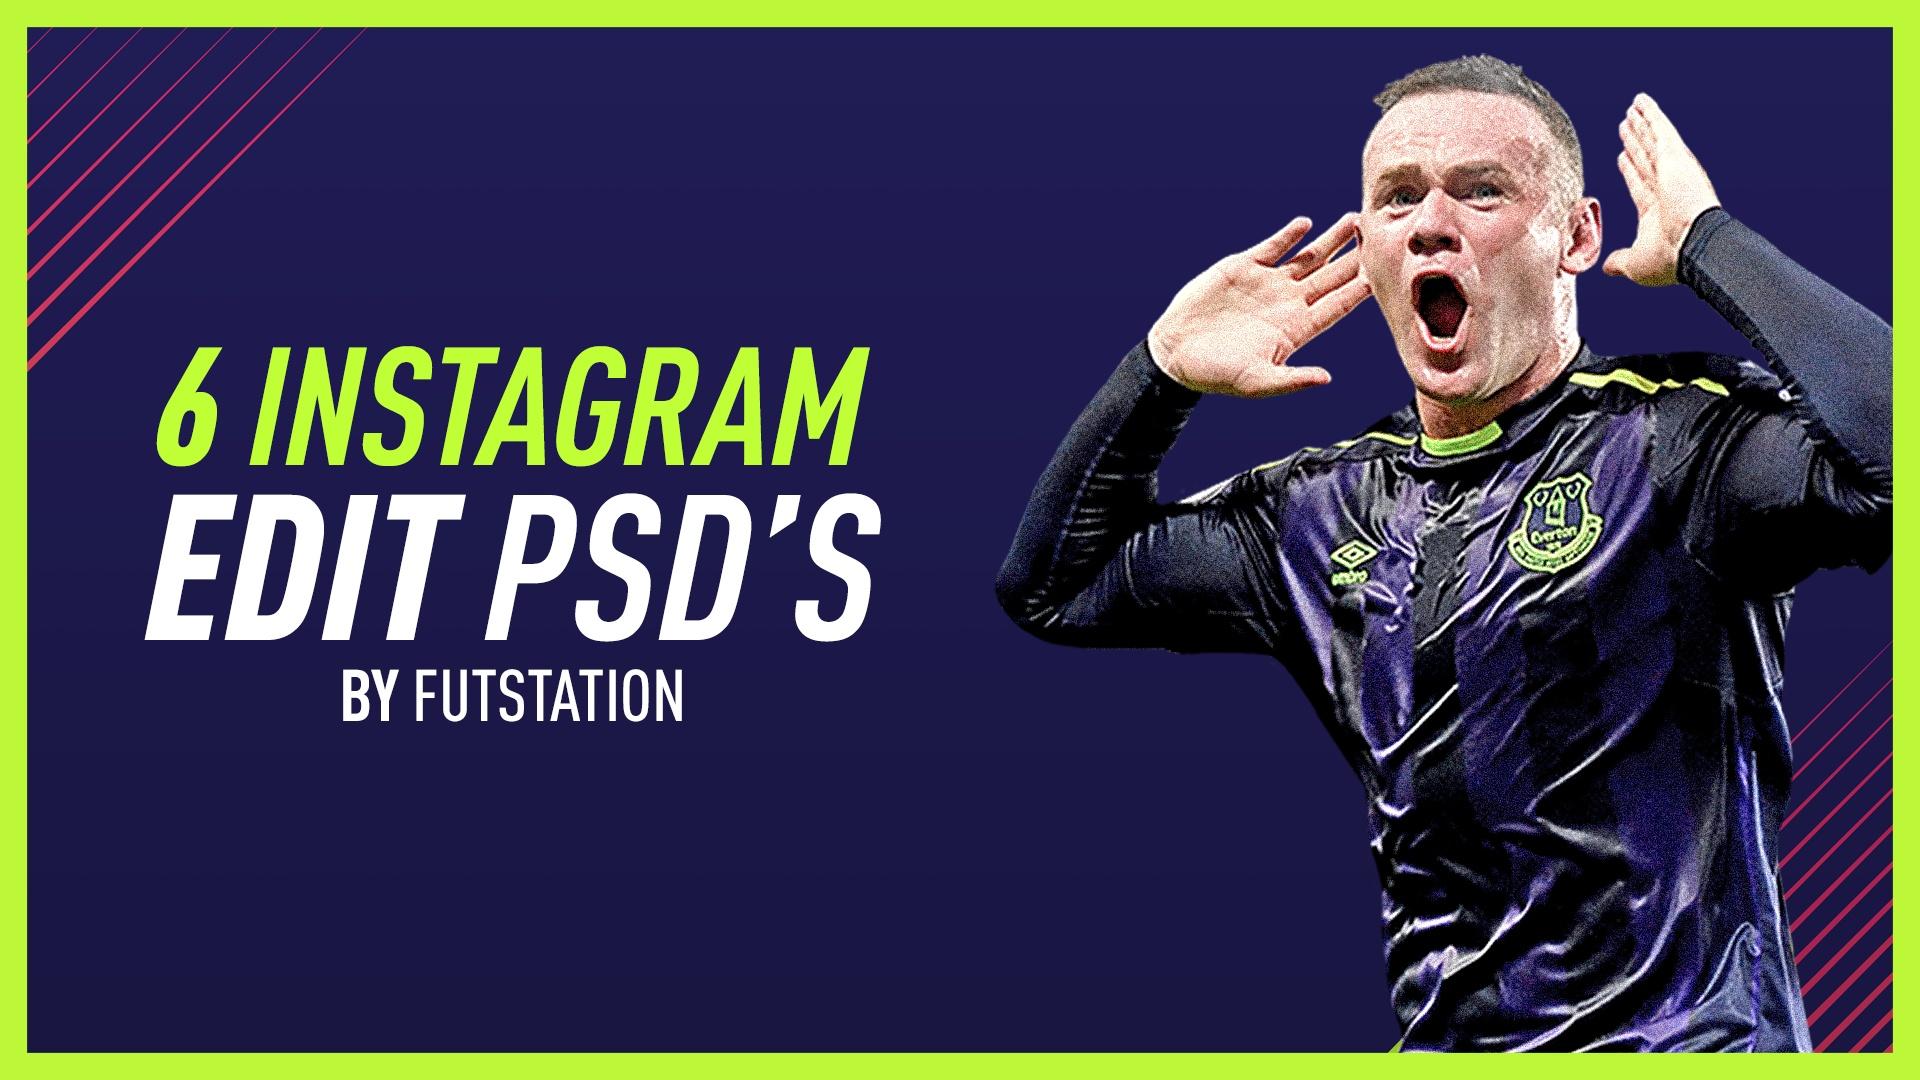 6 INSTAGRAM FIFA EDITS PSD's